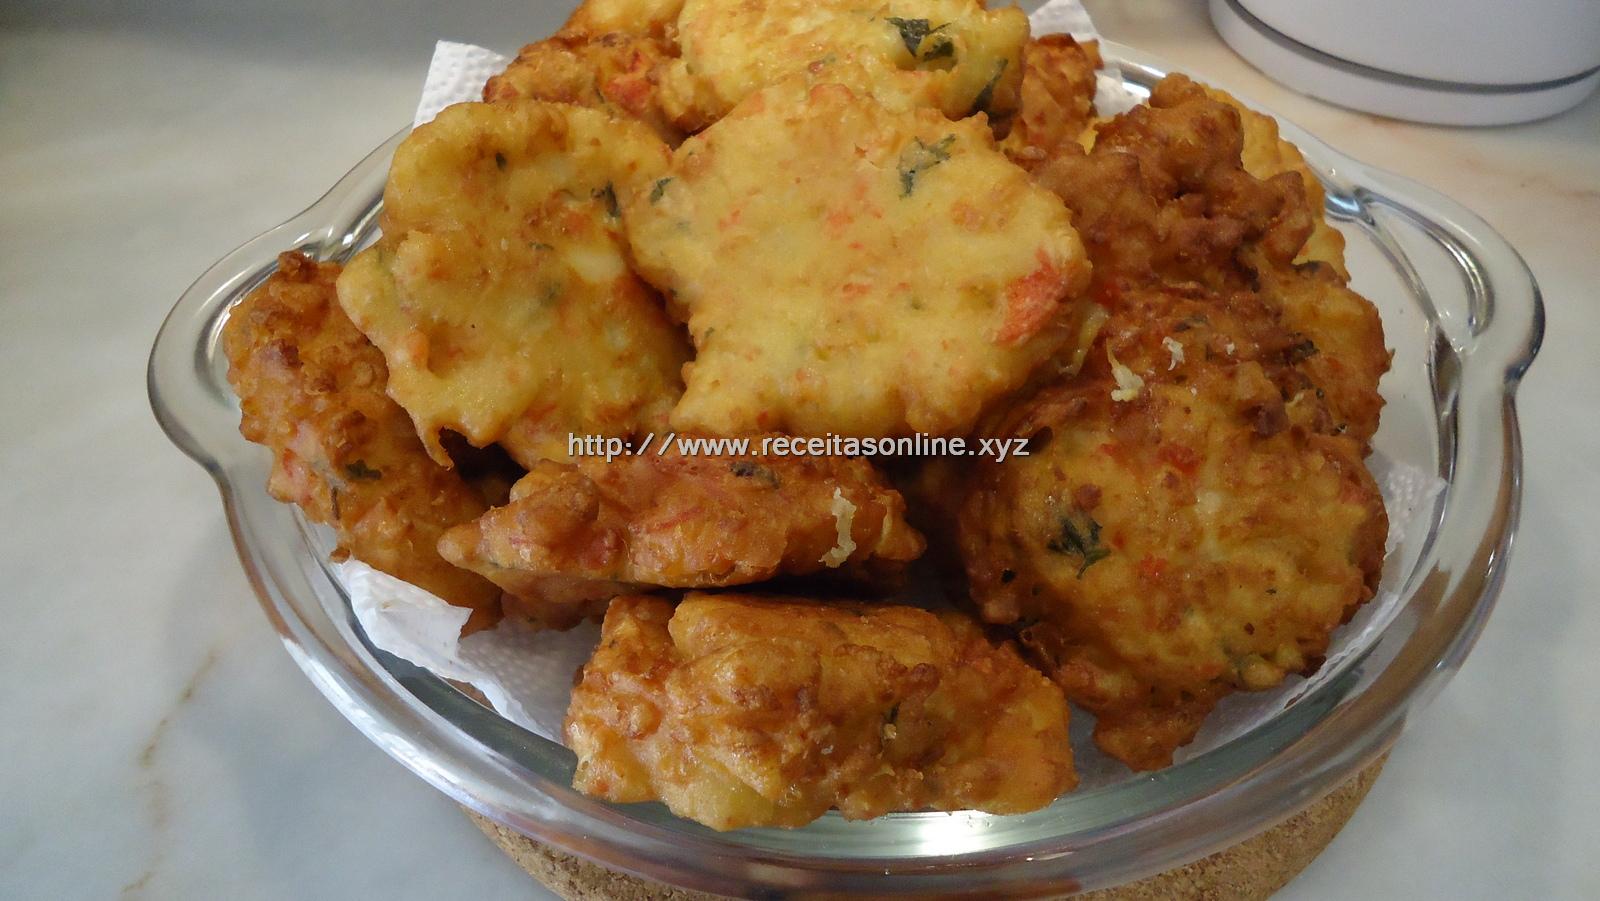 Pataniscas de delicias do mar